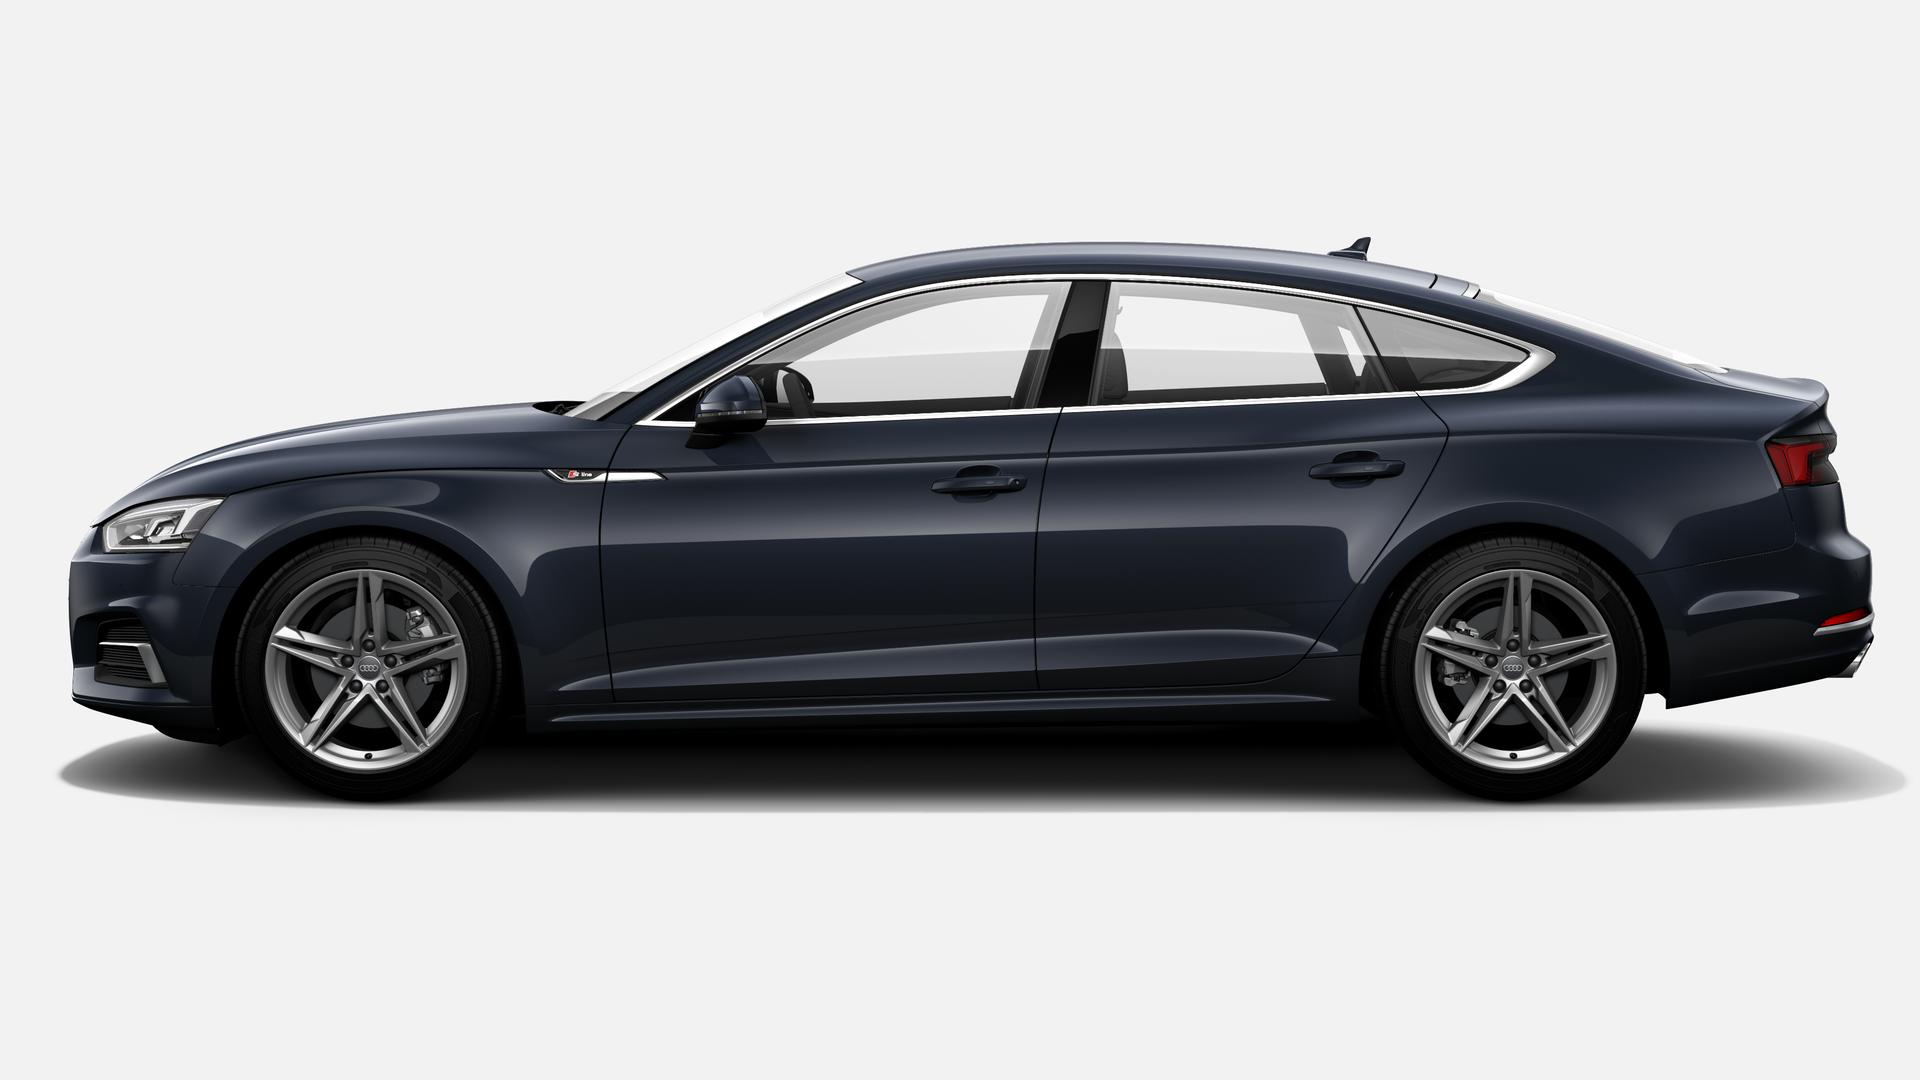 Vista Lateral izquierda de Audi A5 Sportback 1.4 TFSI sport S tronic 110 kW (150 CV)